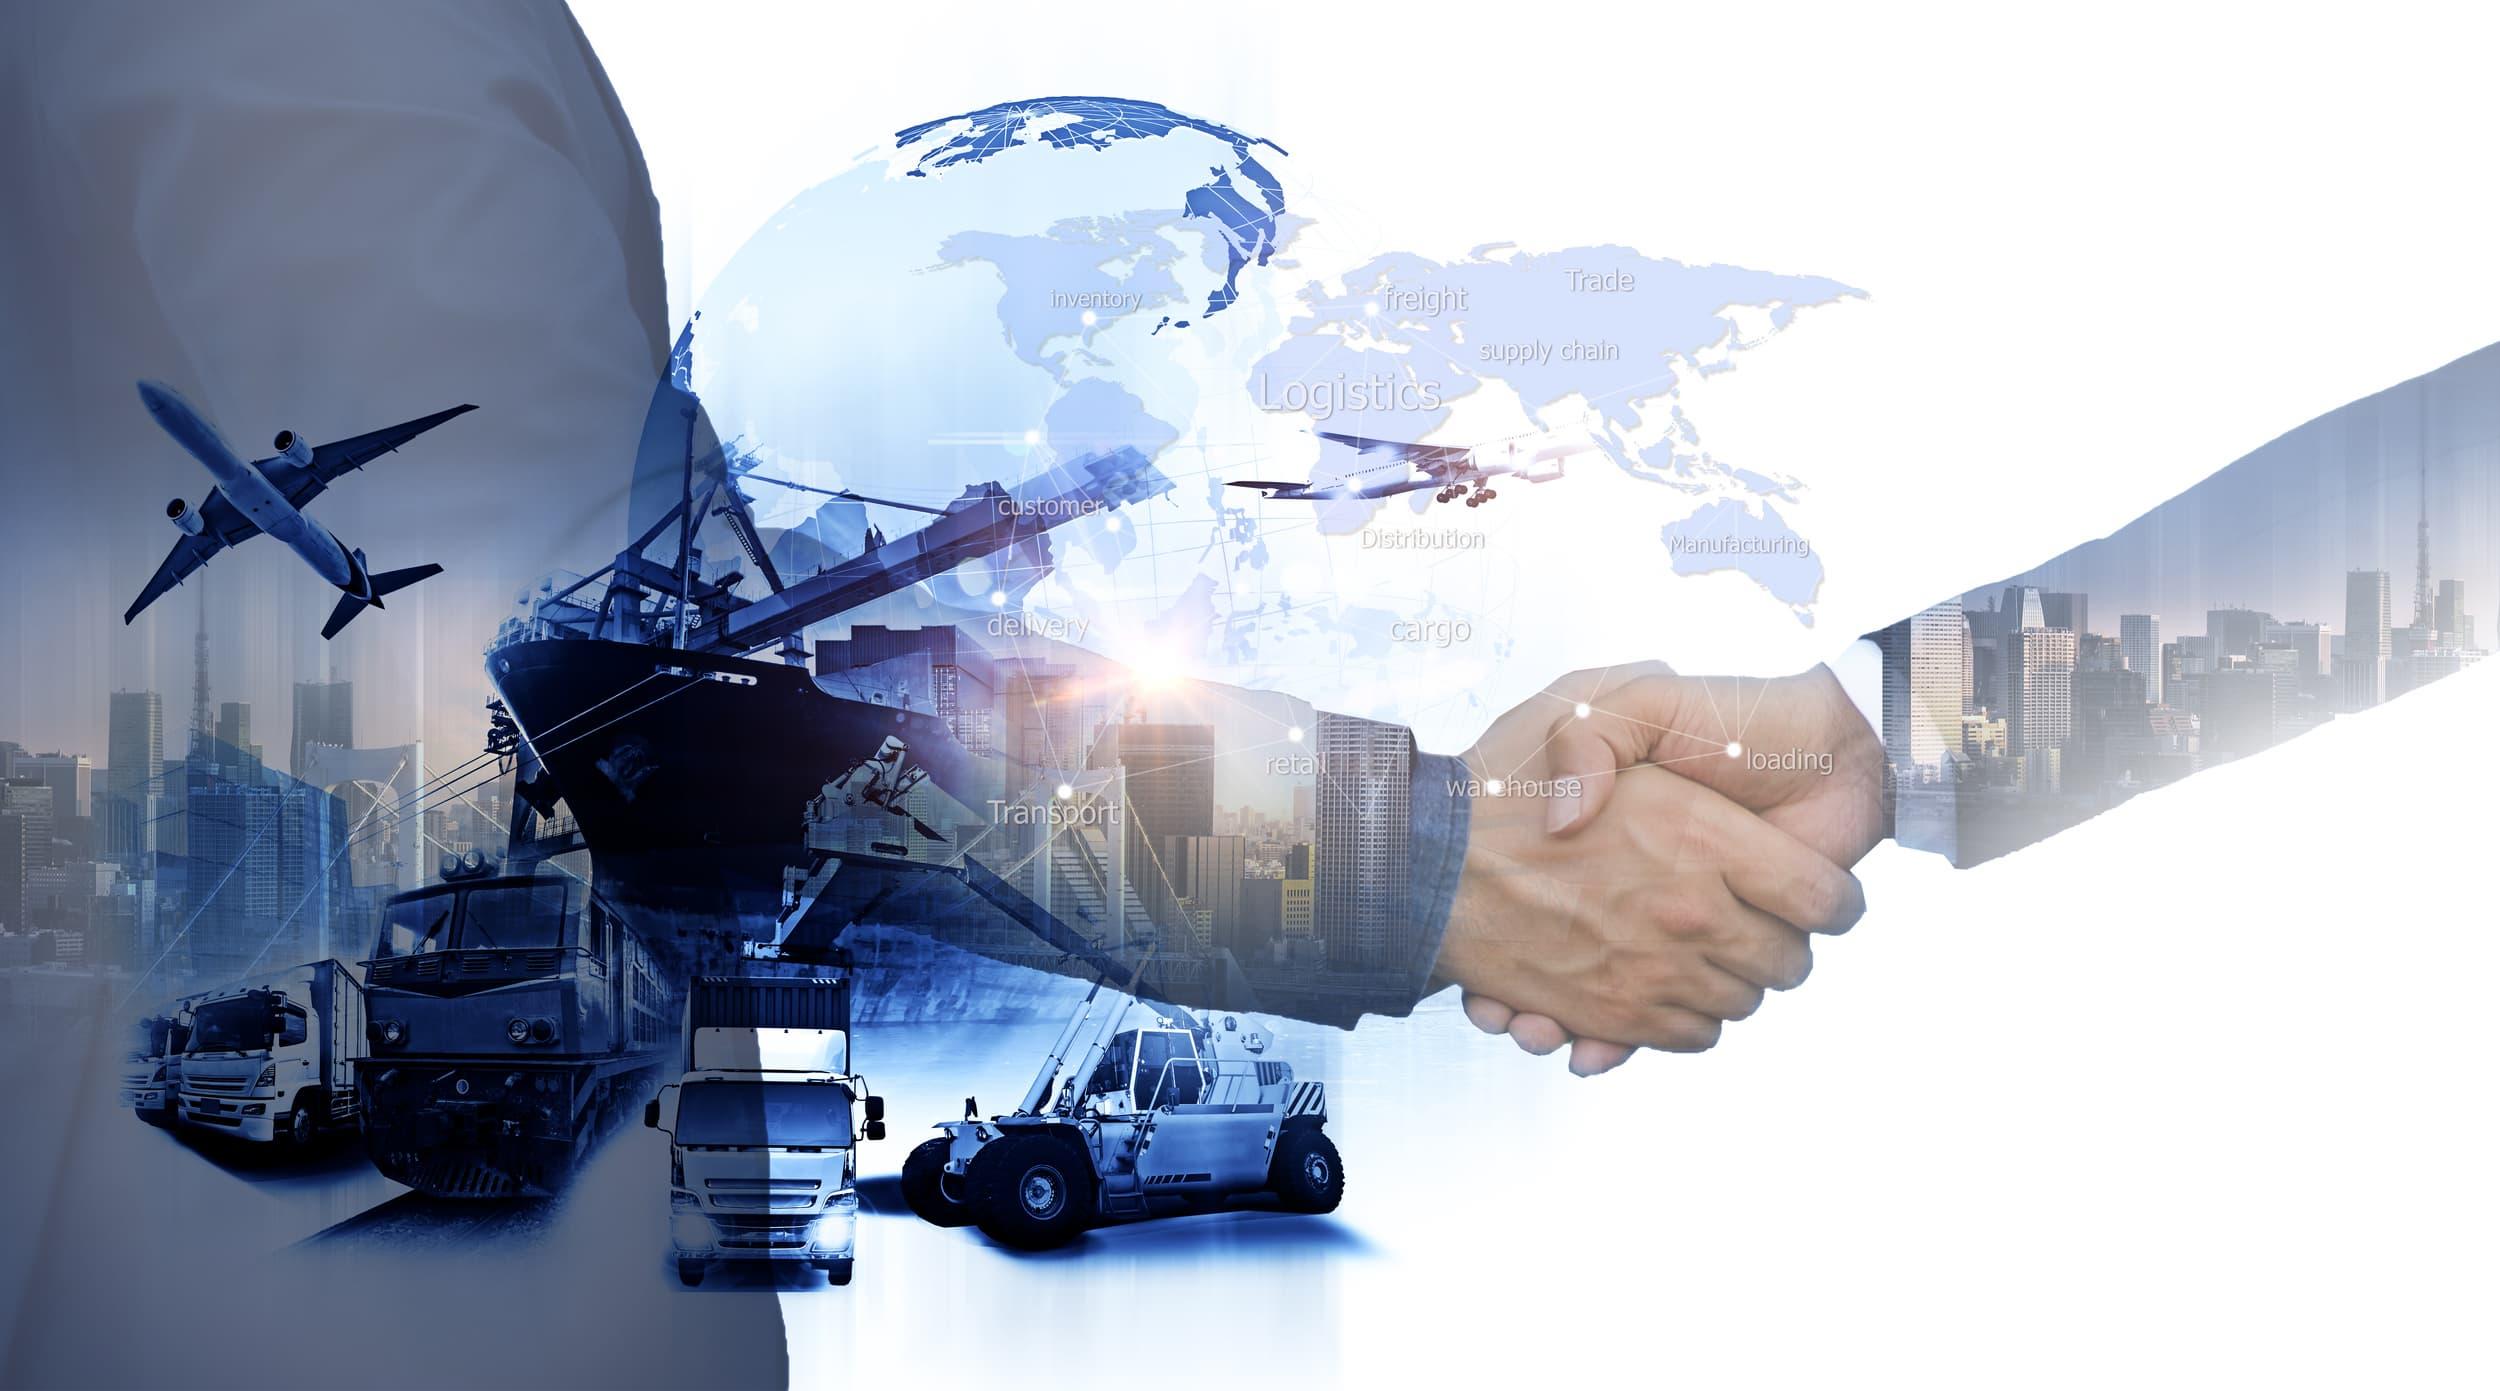 Compliance Training Online DOT, IATA, IMDG HAZMAT Shipping course